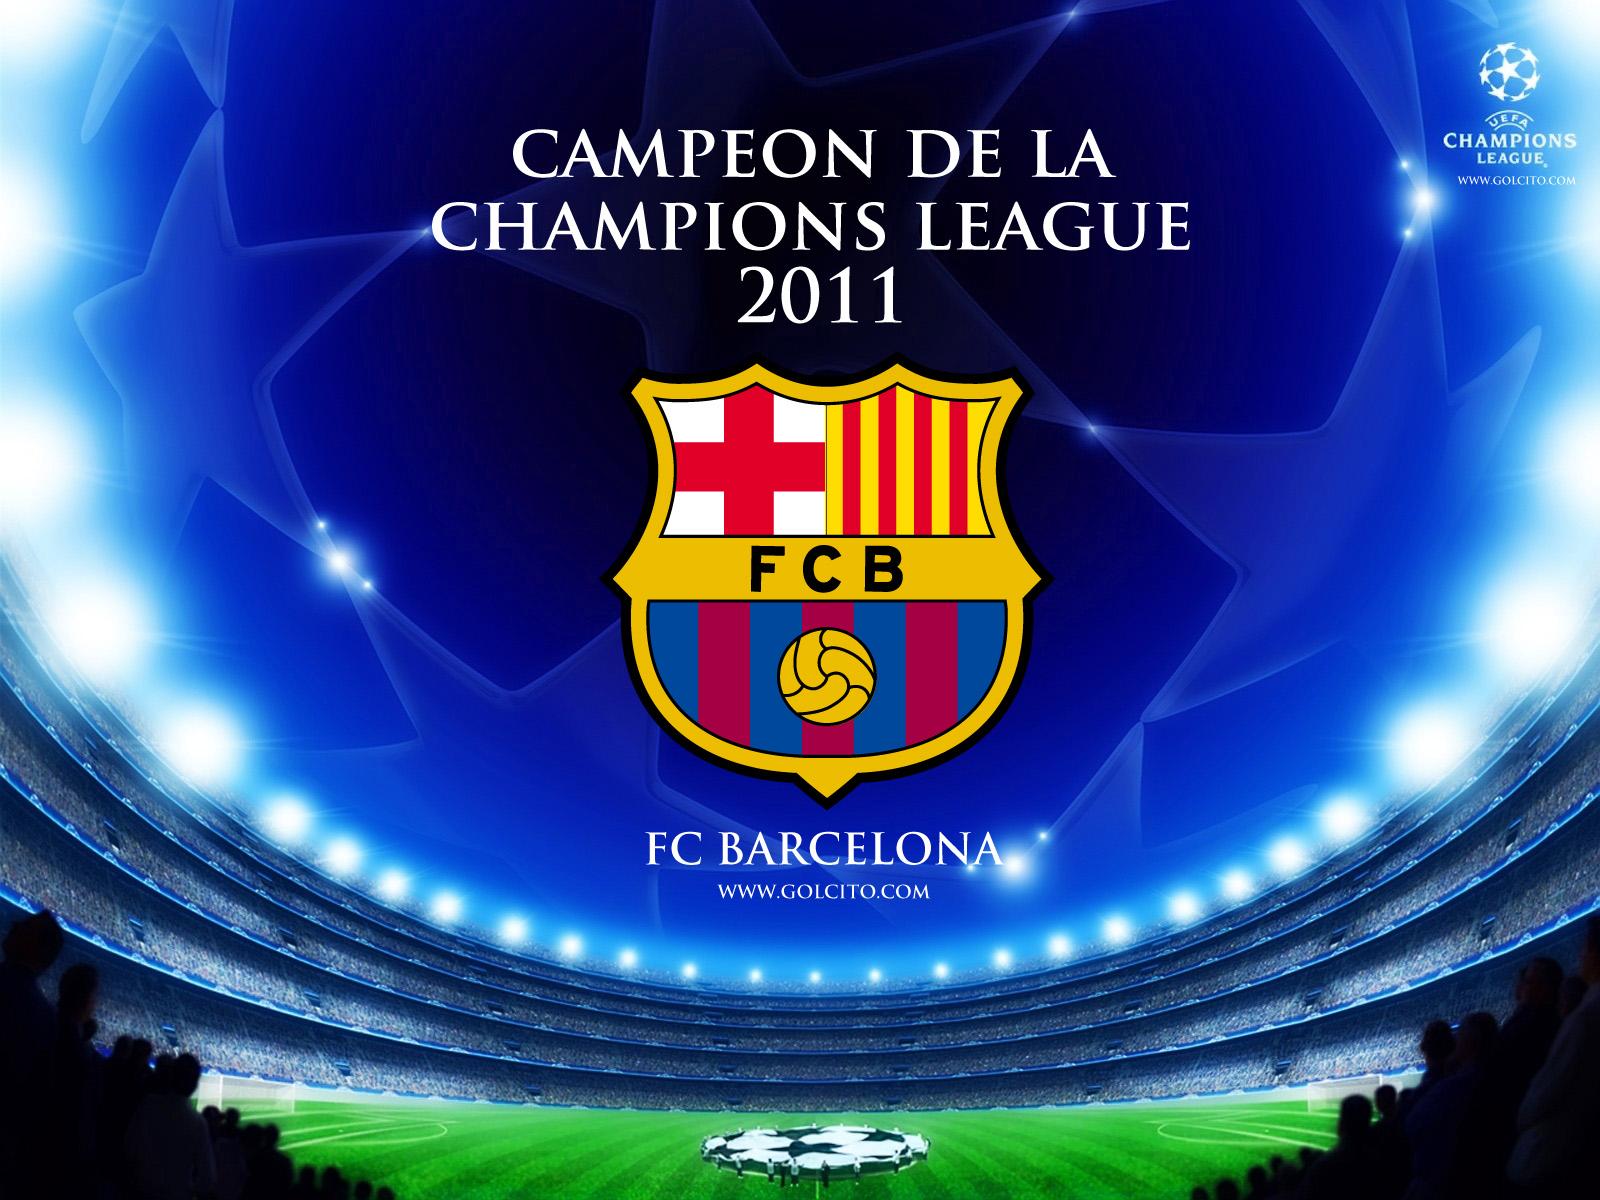 Imagenes De Futbol Champions League - UEFA Champions League Fotos Barcelona – UEFA